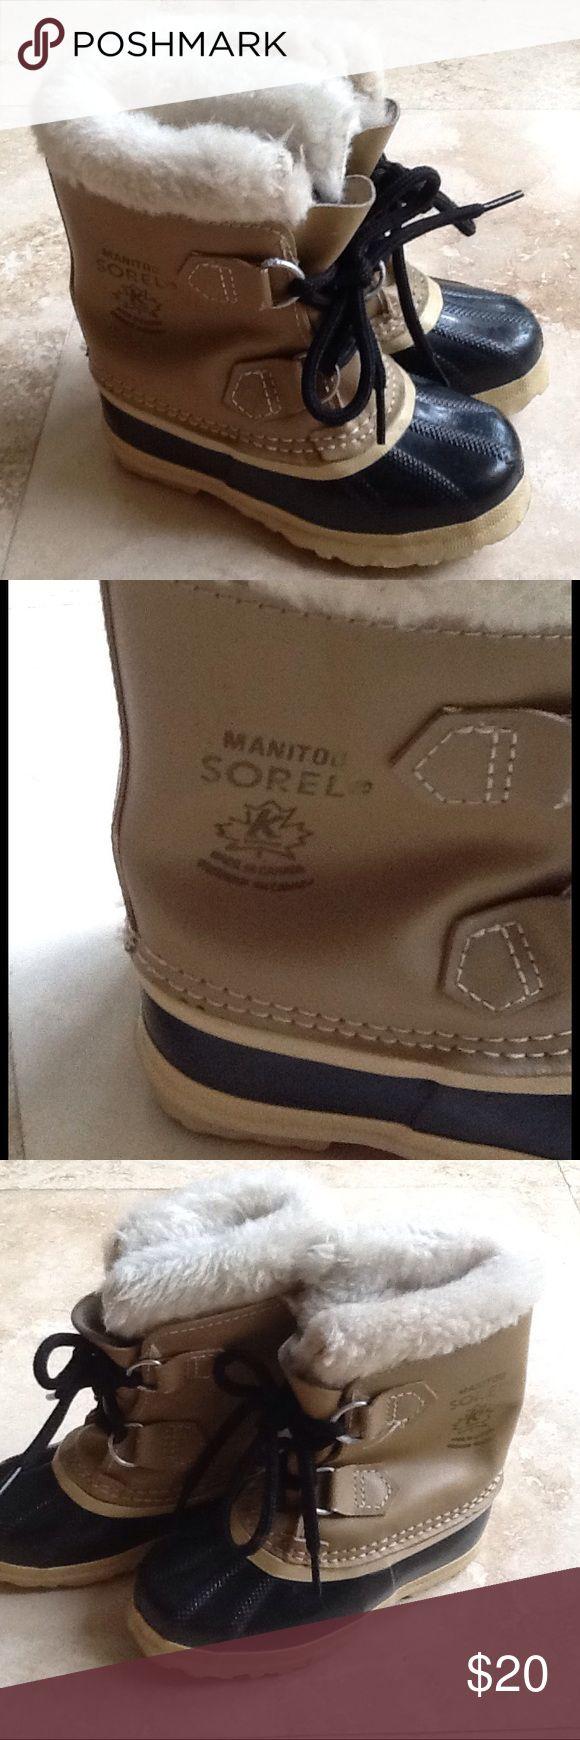 Best 25+ Sorel duck boots ideas on Pinterest | Sorel boots, Winter ...